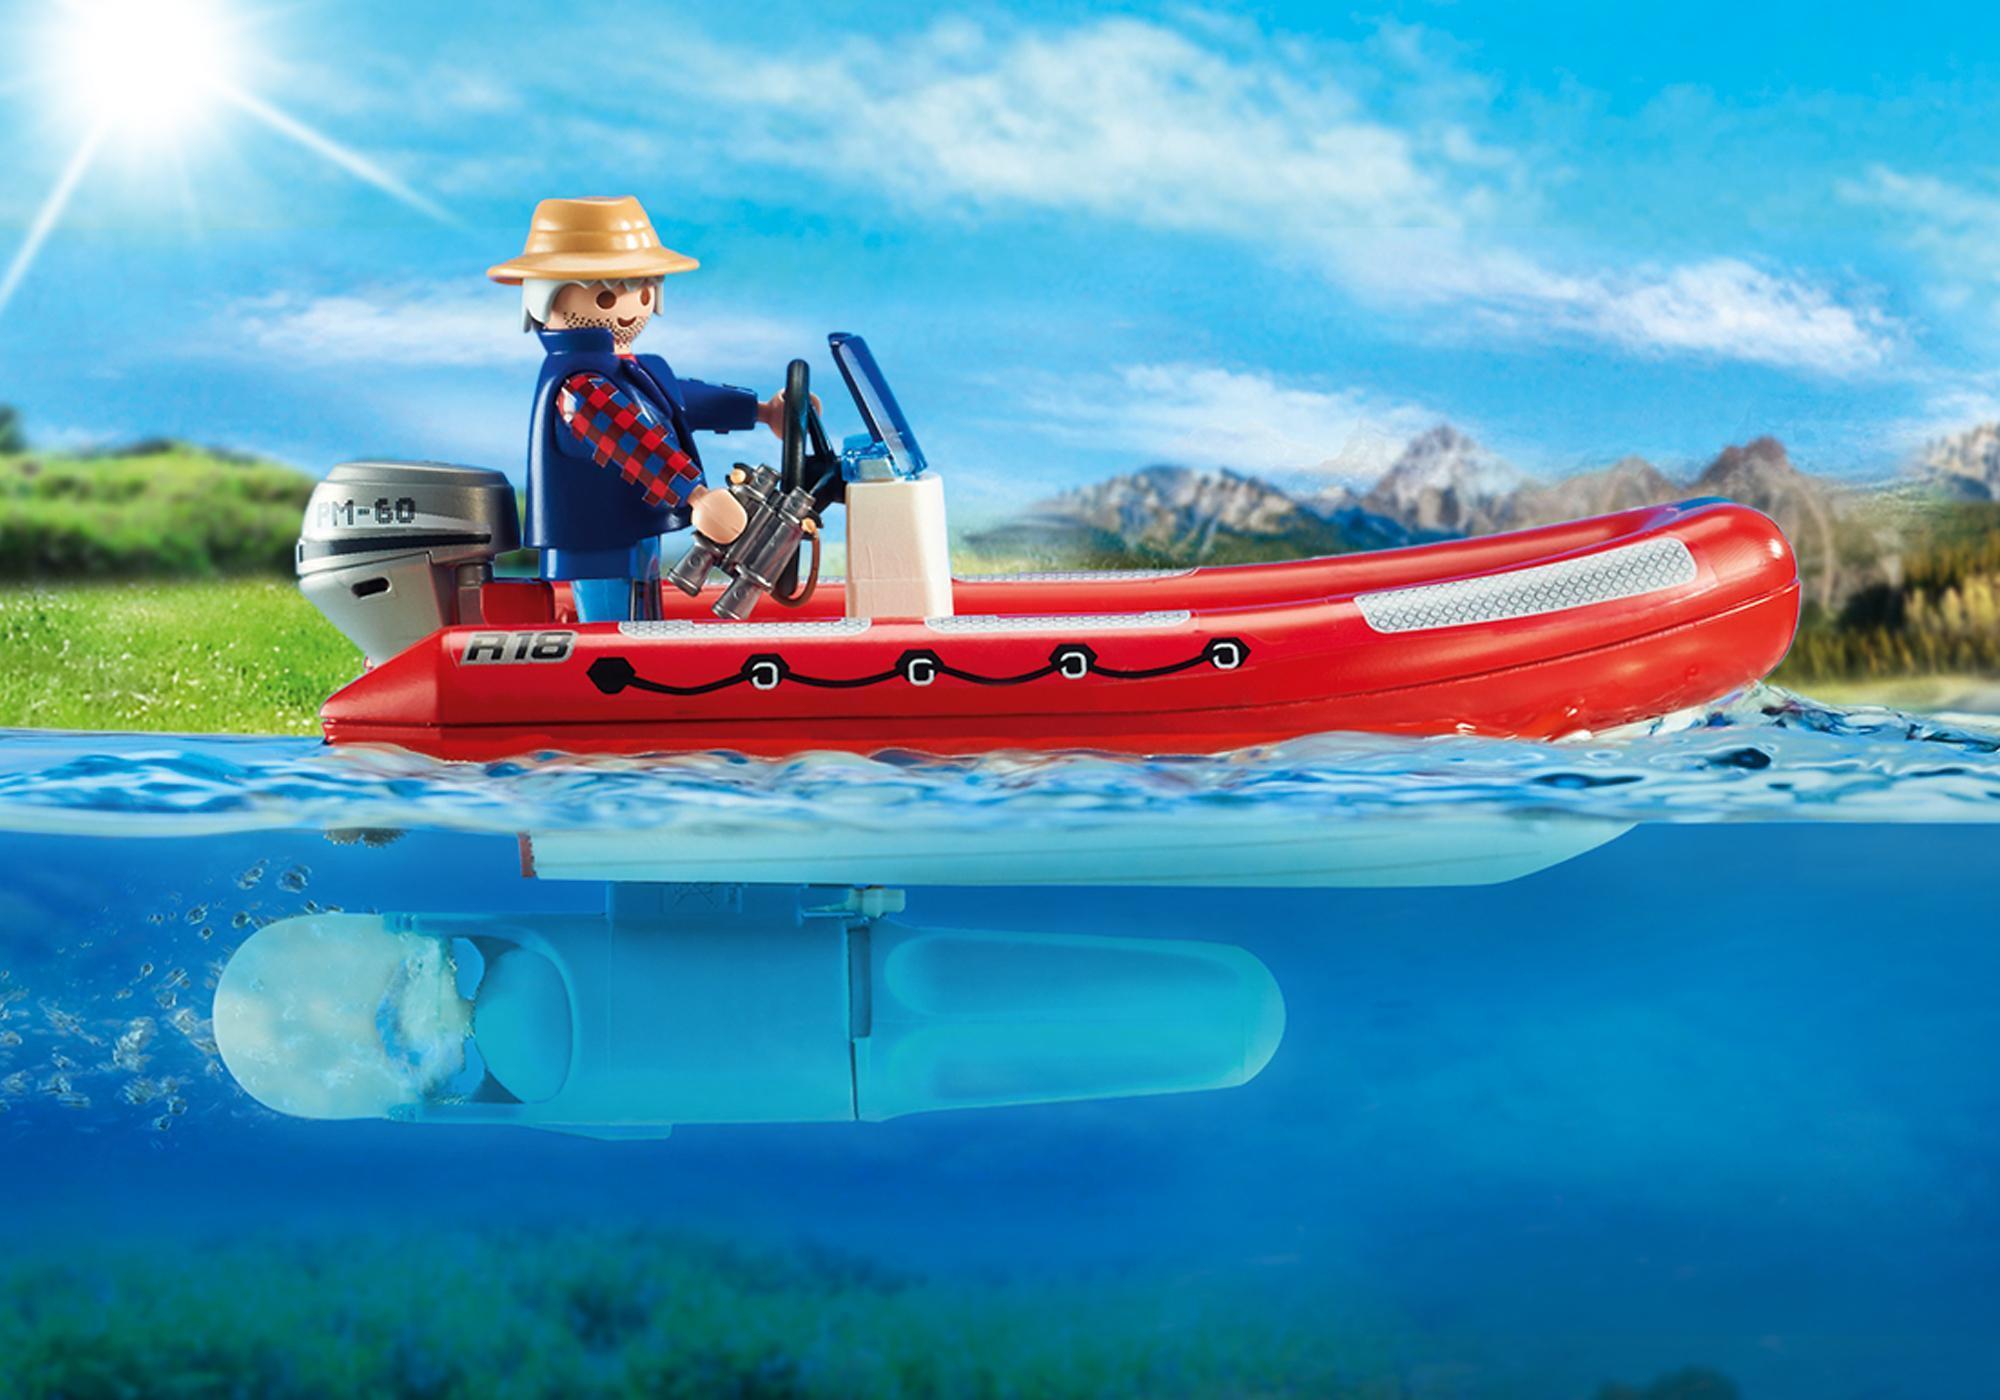 http://media.playmobil.com/i/playmobil/5559_product_extra1/Schlauchboot mit Wilderern